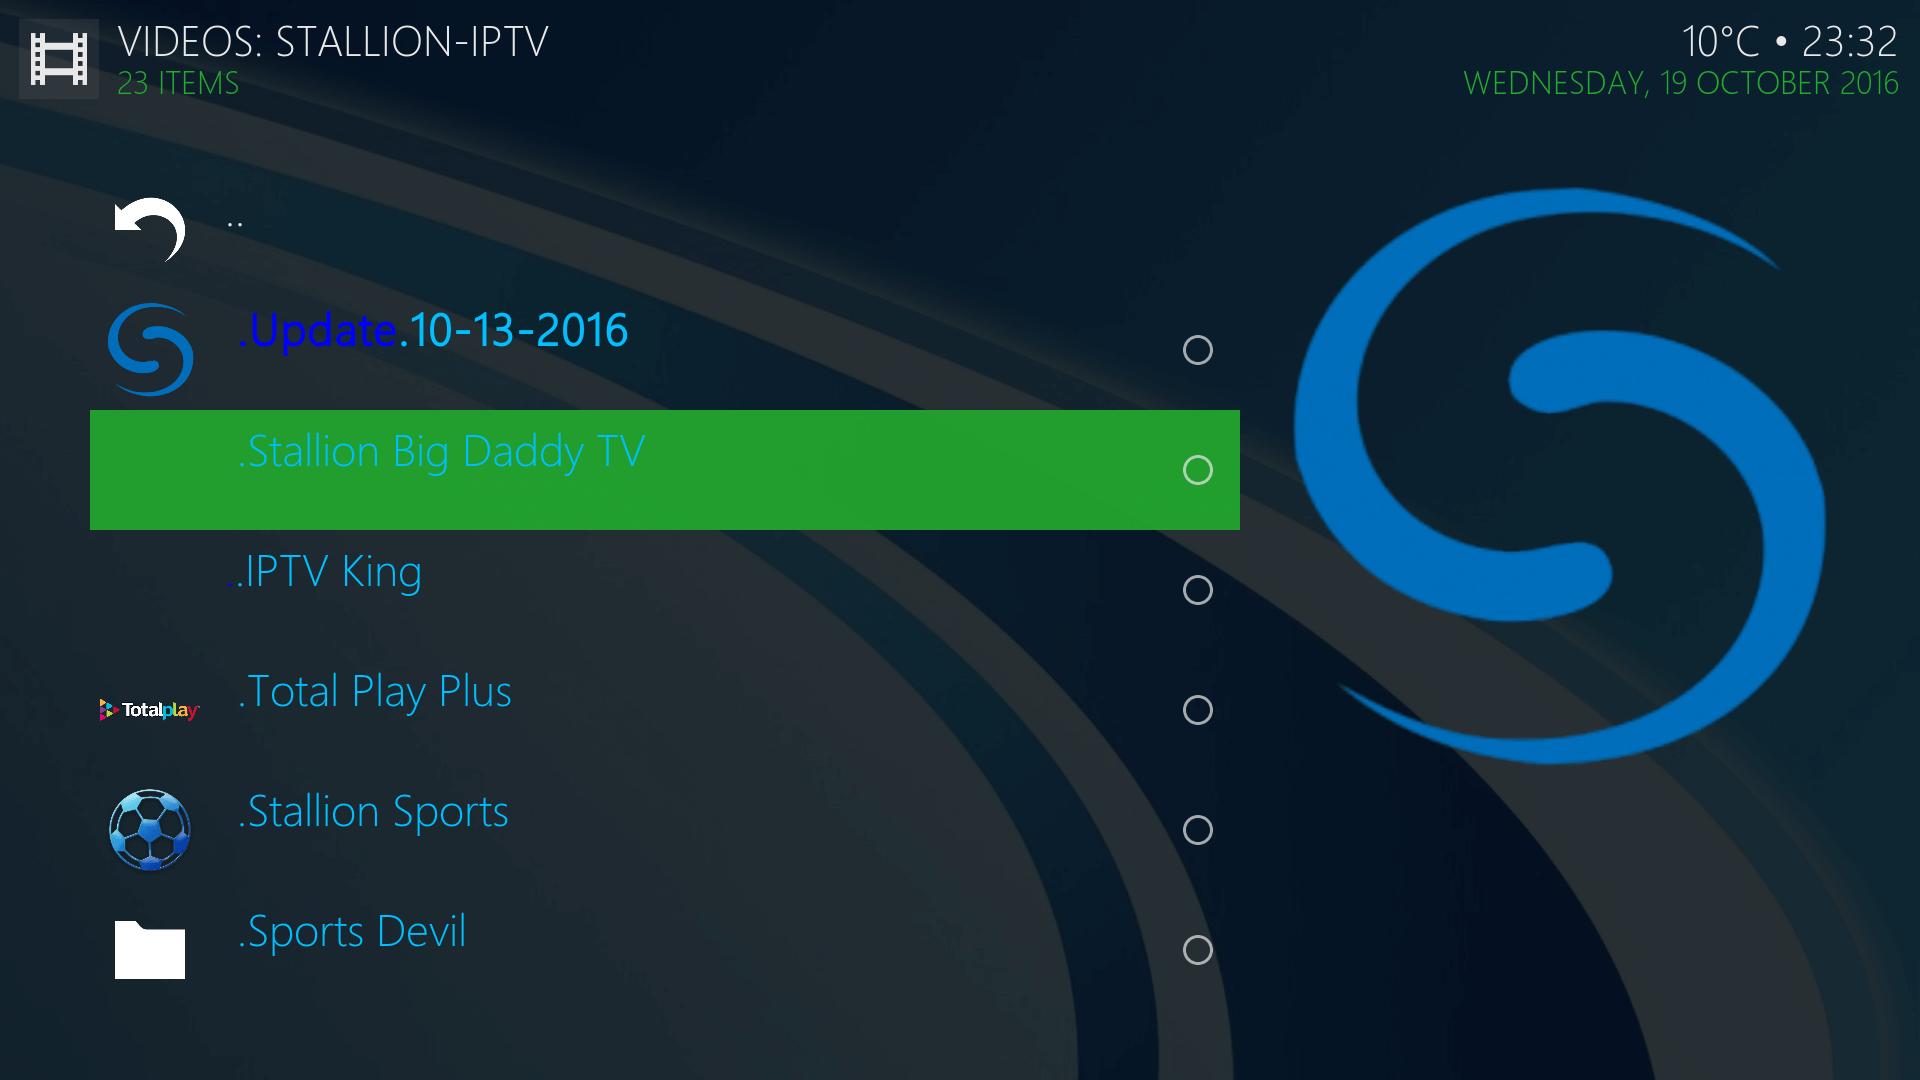 screenshot-2016-10-19-23-32-20